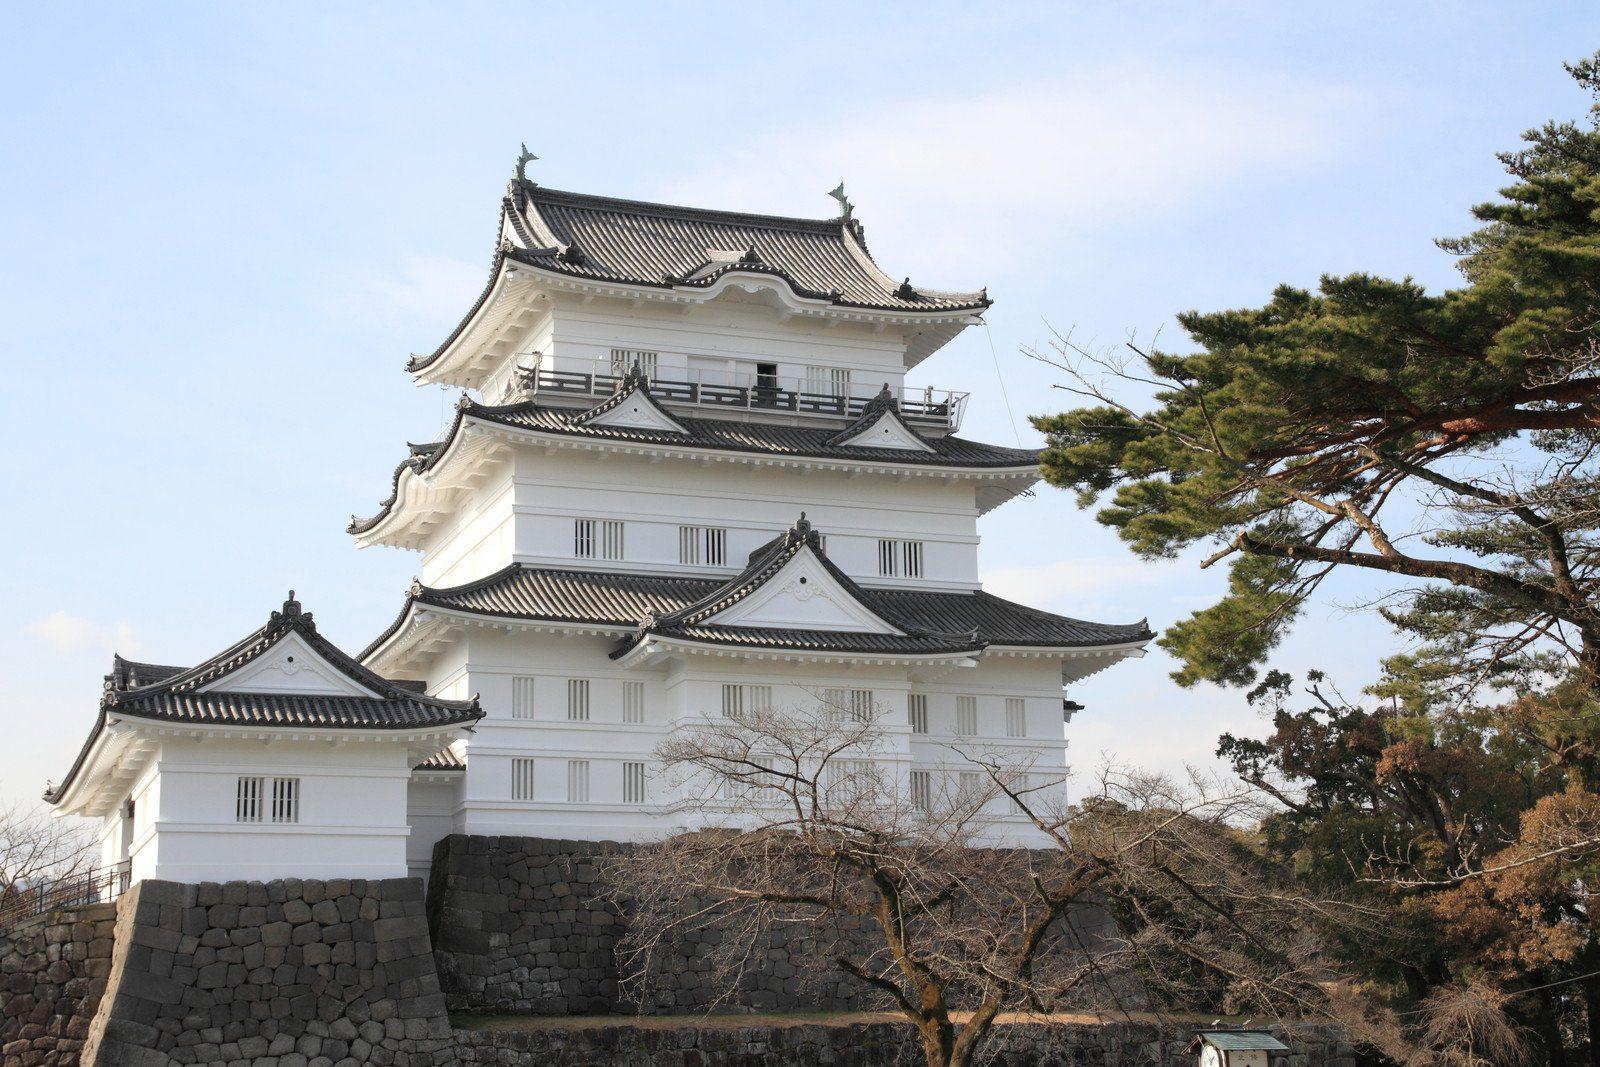 Odawara Castle in Kanagawa, the entry to the Hakone region